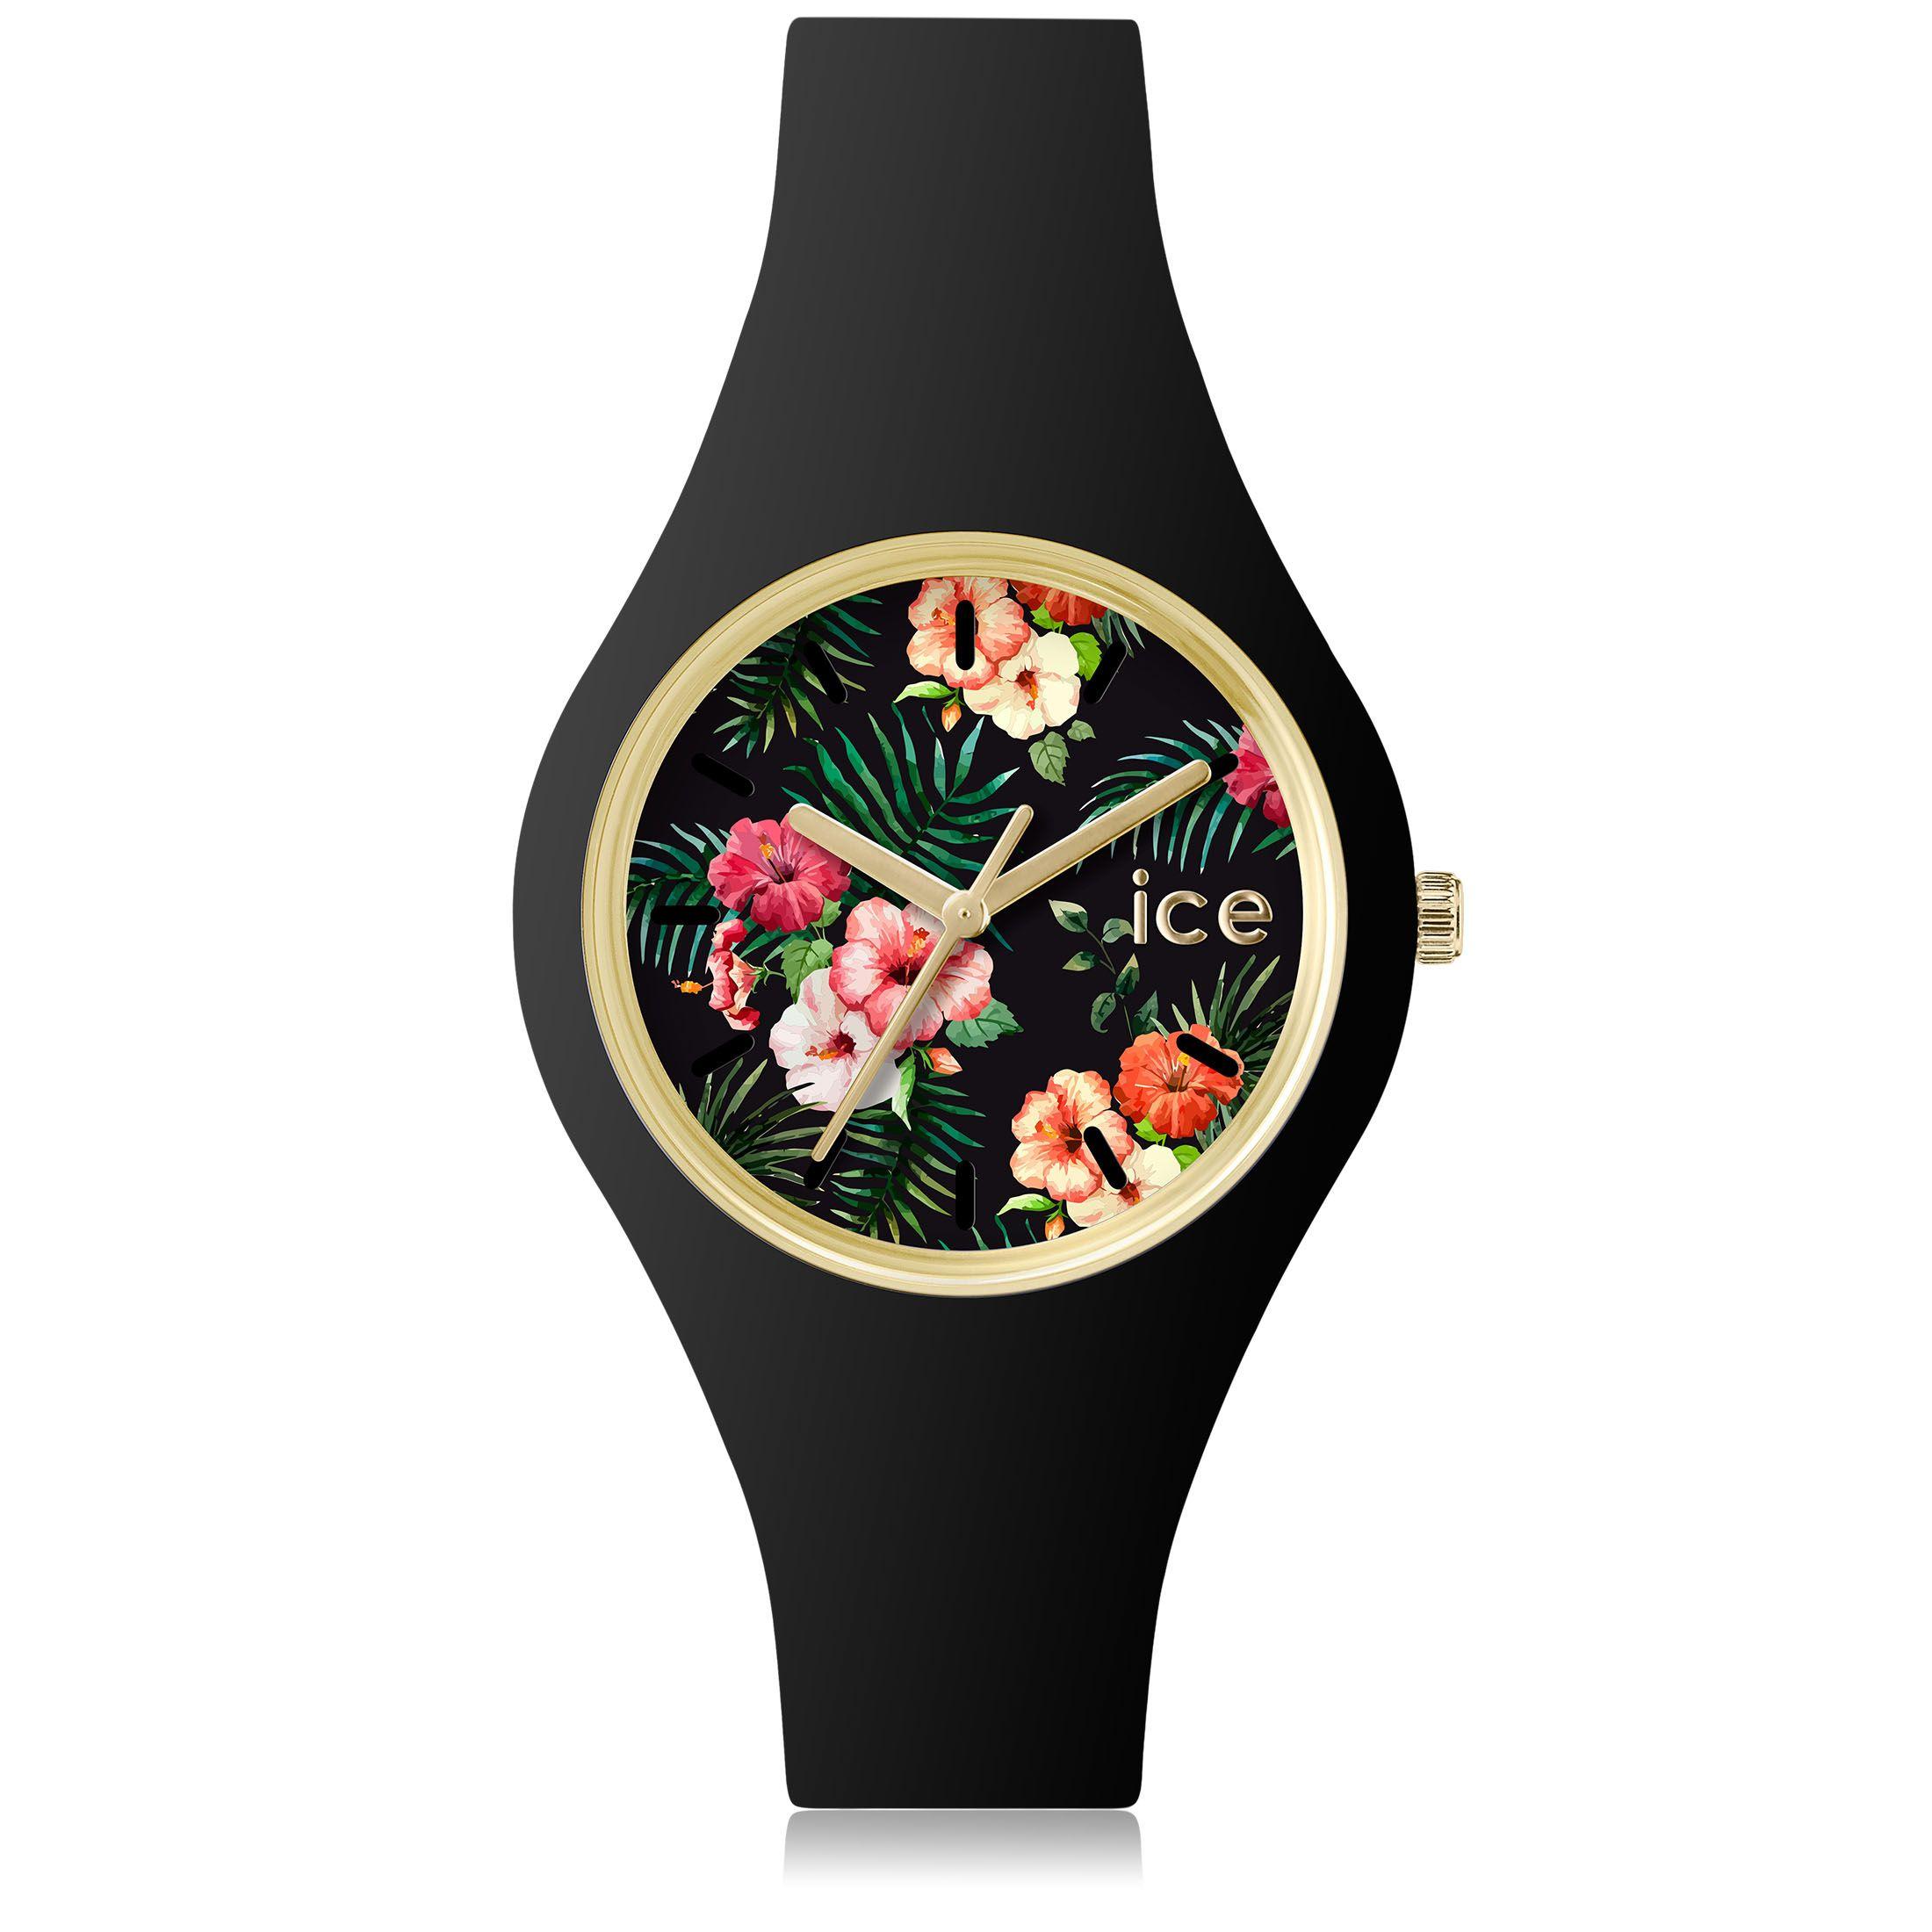 bdb612f910f28b Montre Ice-Watch ICE flower - noire - Moyenne   Accessories ...